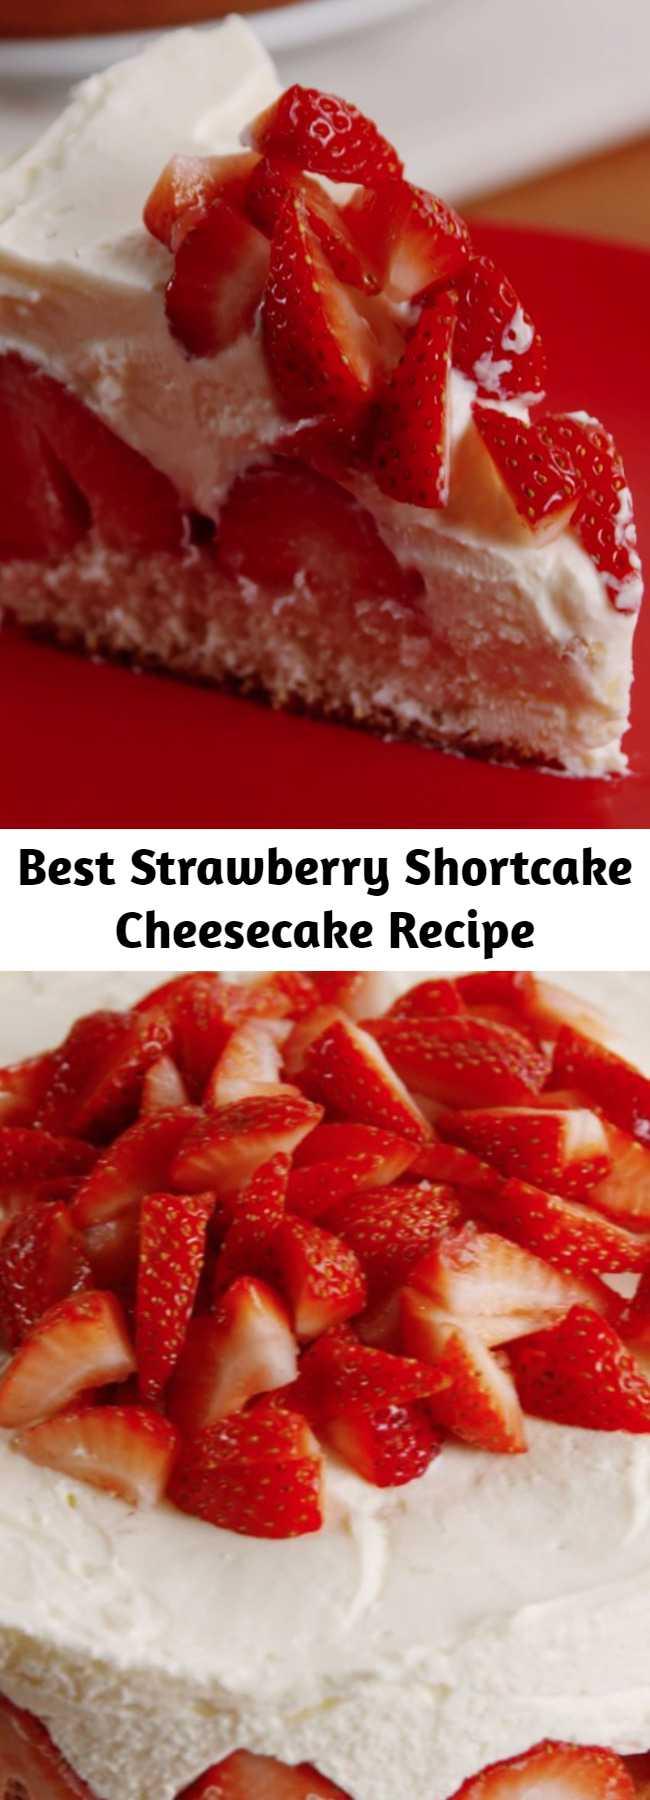 Best Strawberry Shortcake Cheesecake Recipe - Classic cheesecake gets a summery upgrade.